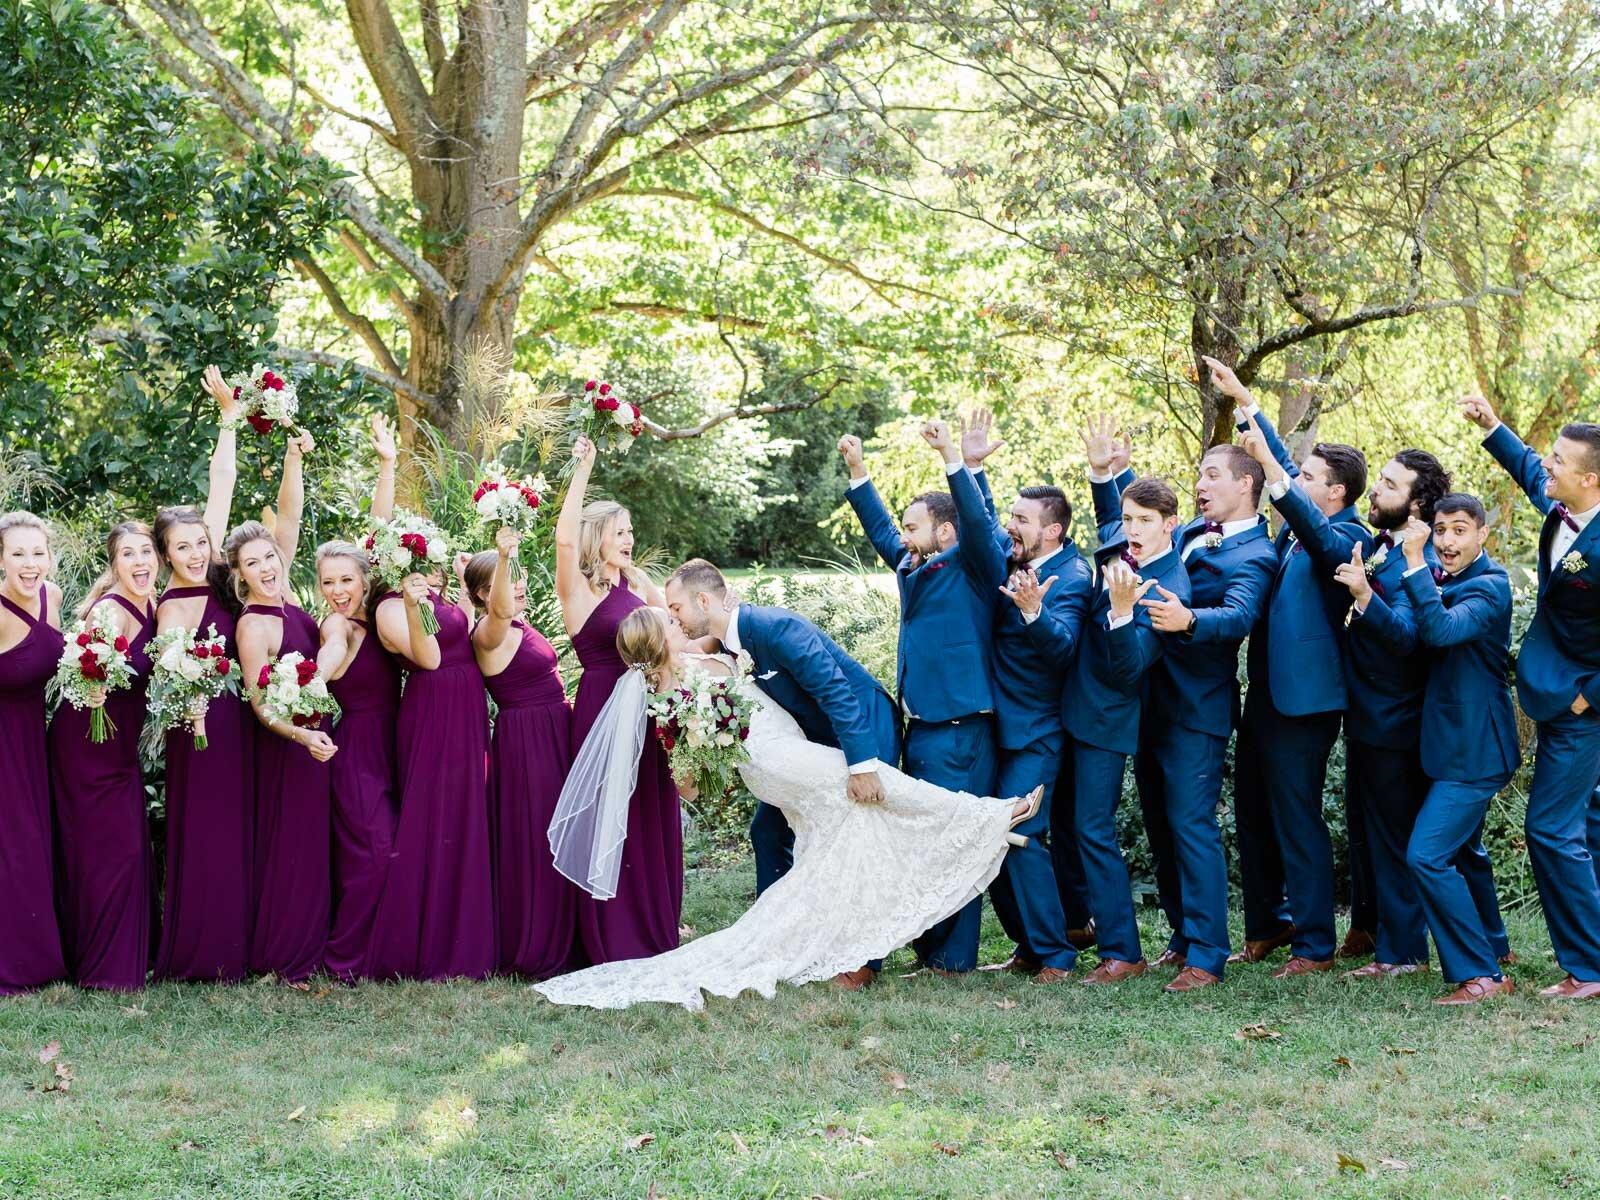 Elegant and Joyful Wedding at Crago Farms in Columbus, Ohio-34.jpg